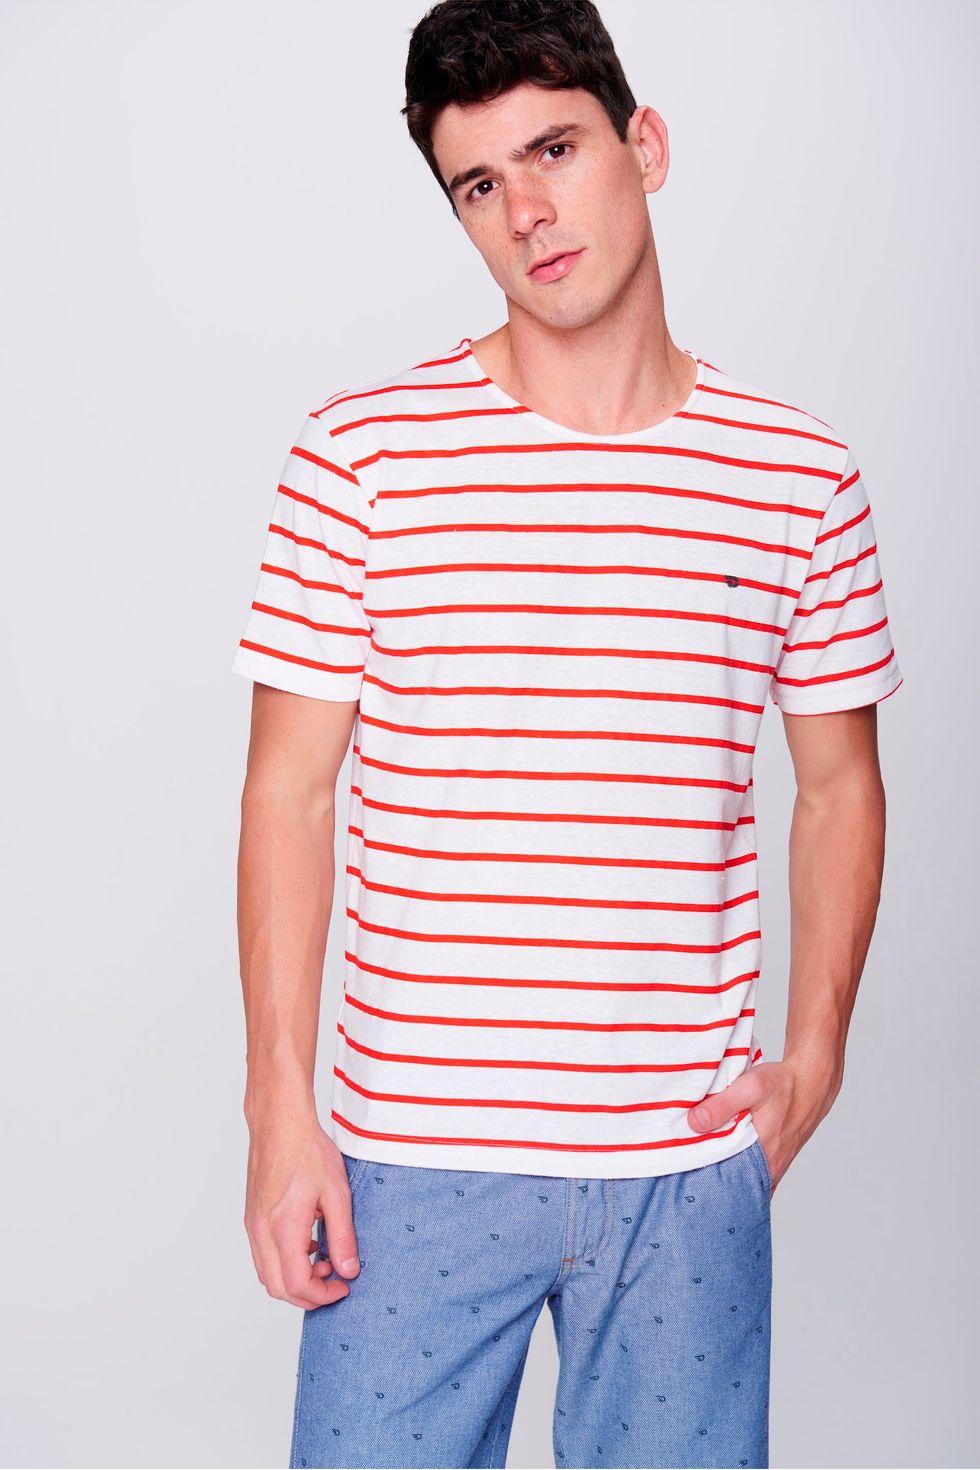 Camiseta-Basica-Listrada-Masculina-Frente--